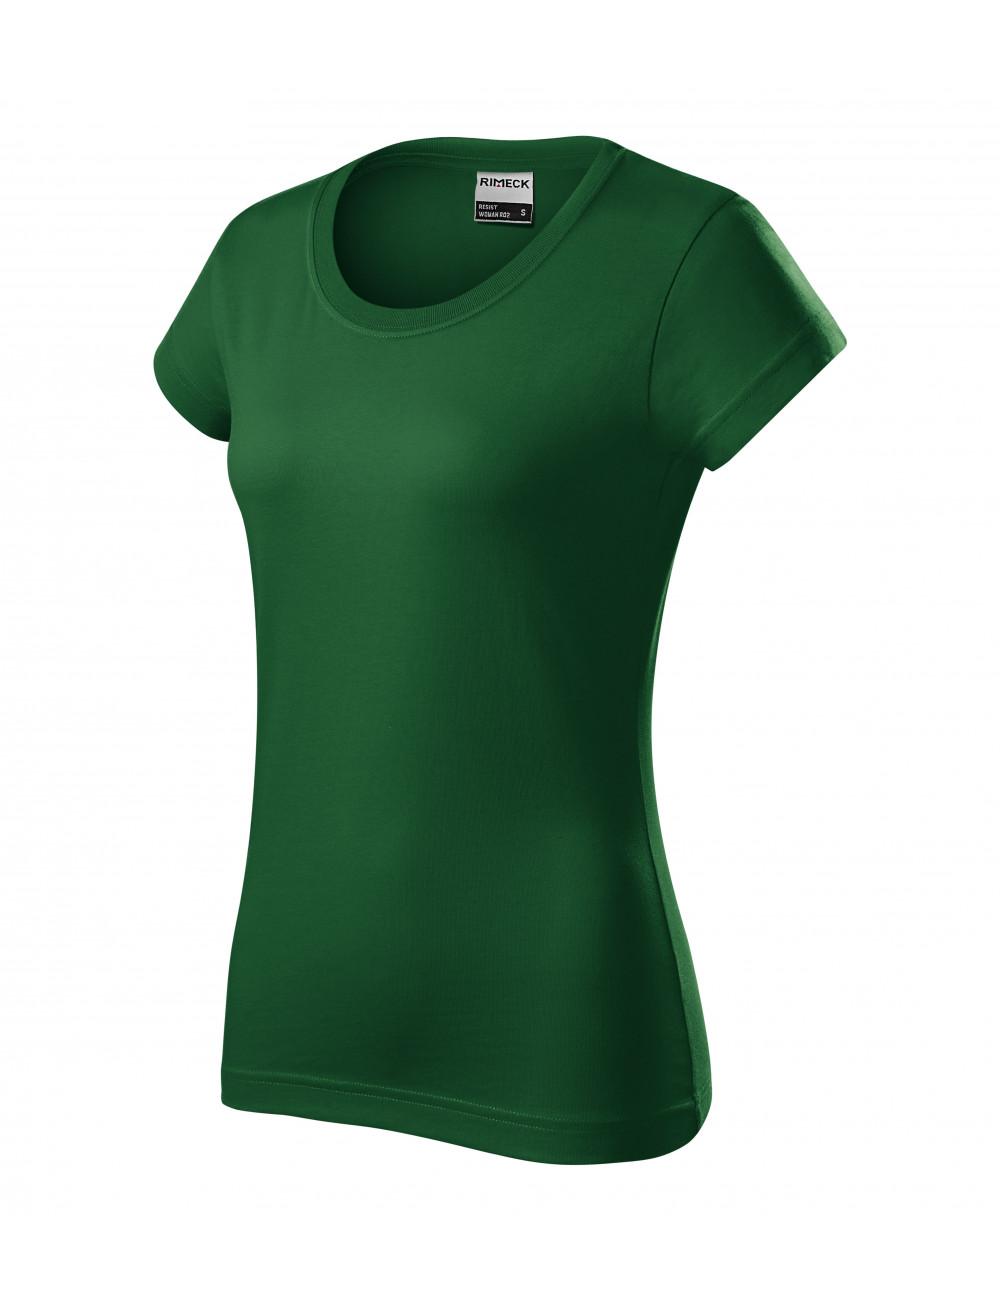 Adler RIMECK Koszulka damska Resist heavy R04 zieleń butelkowa